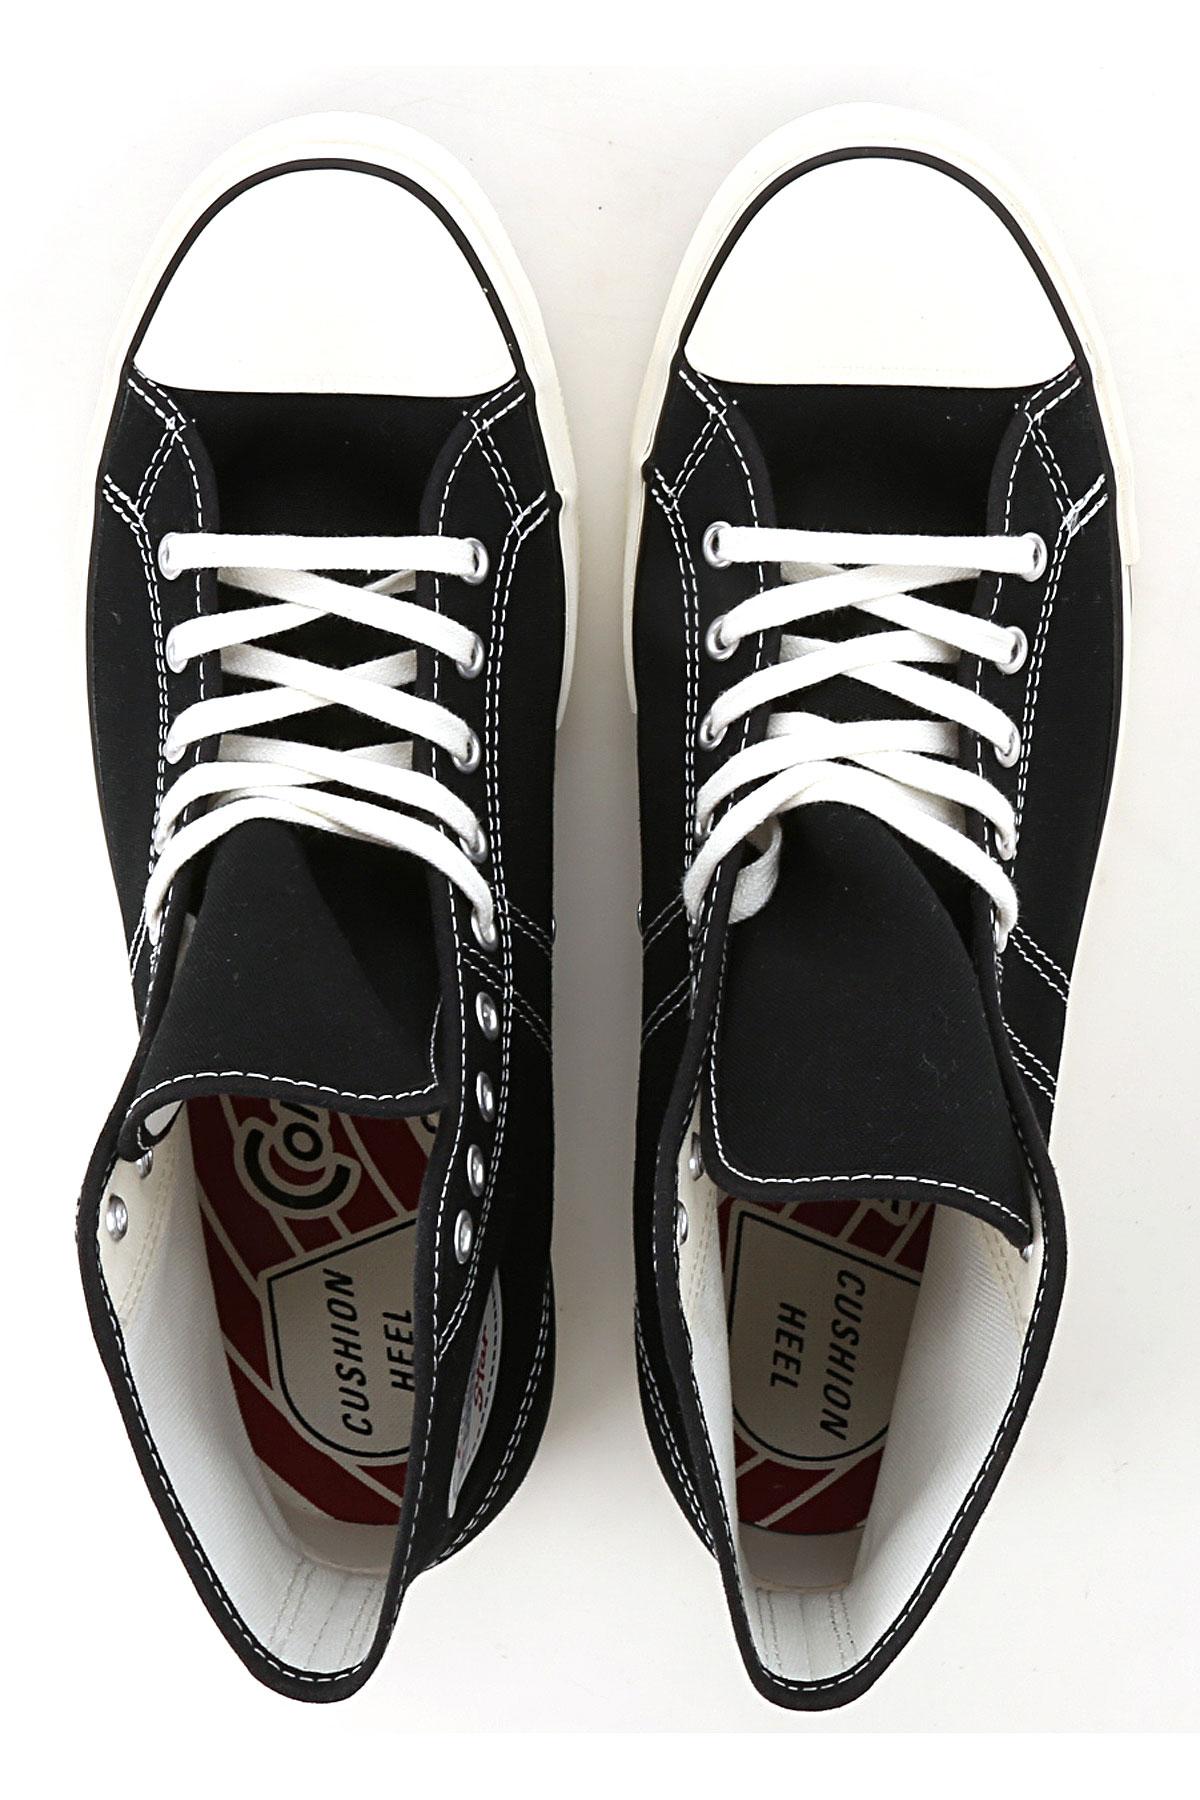 Primavera Negro 2019 Converse Blanco Hombres verano Para Zapatos CnxttBTq